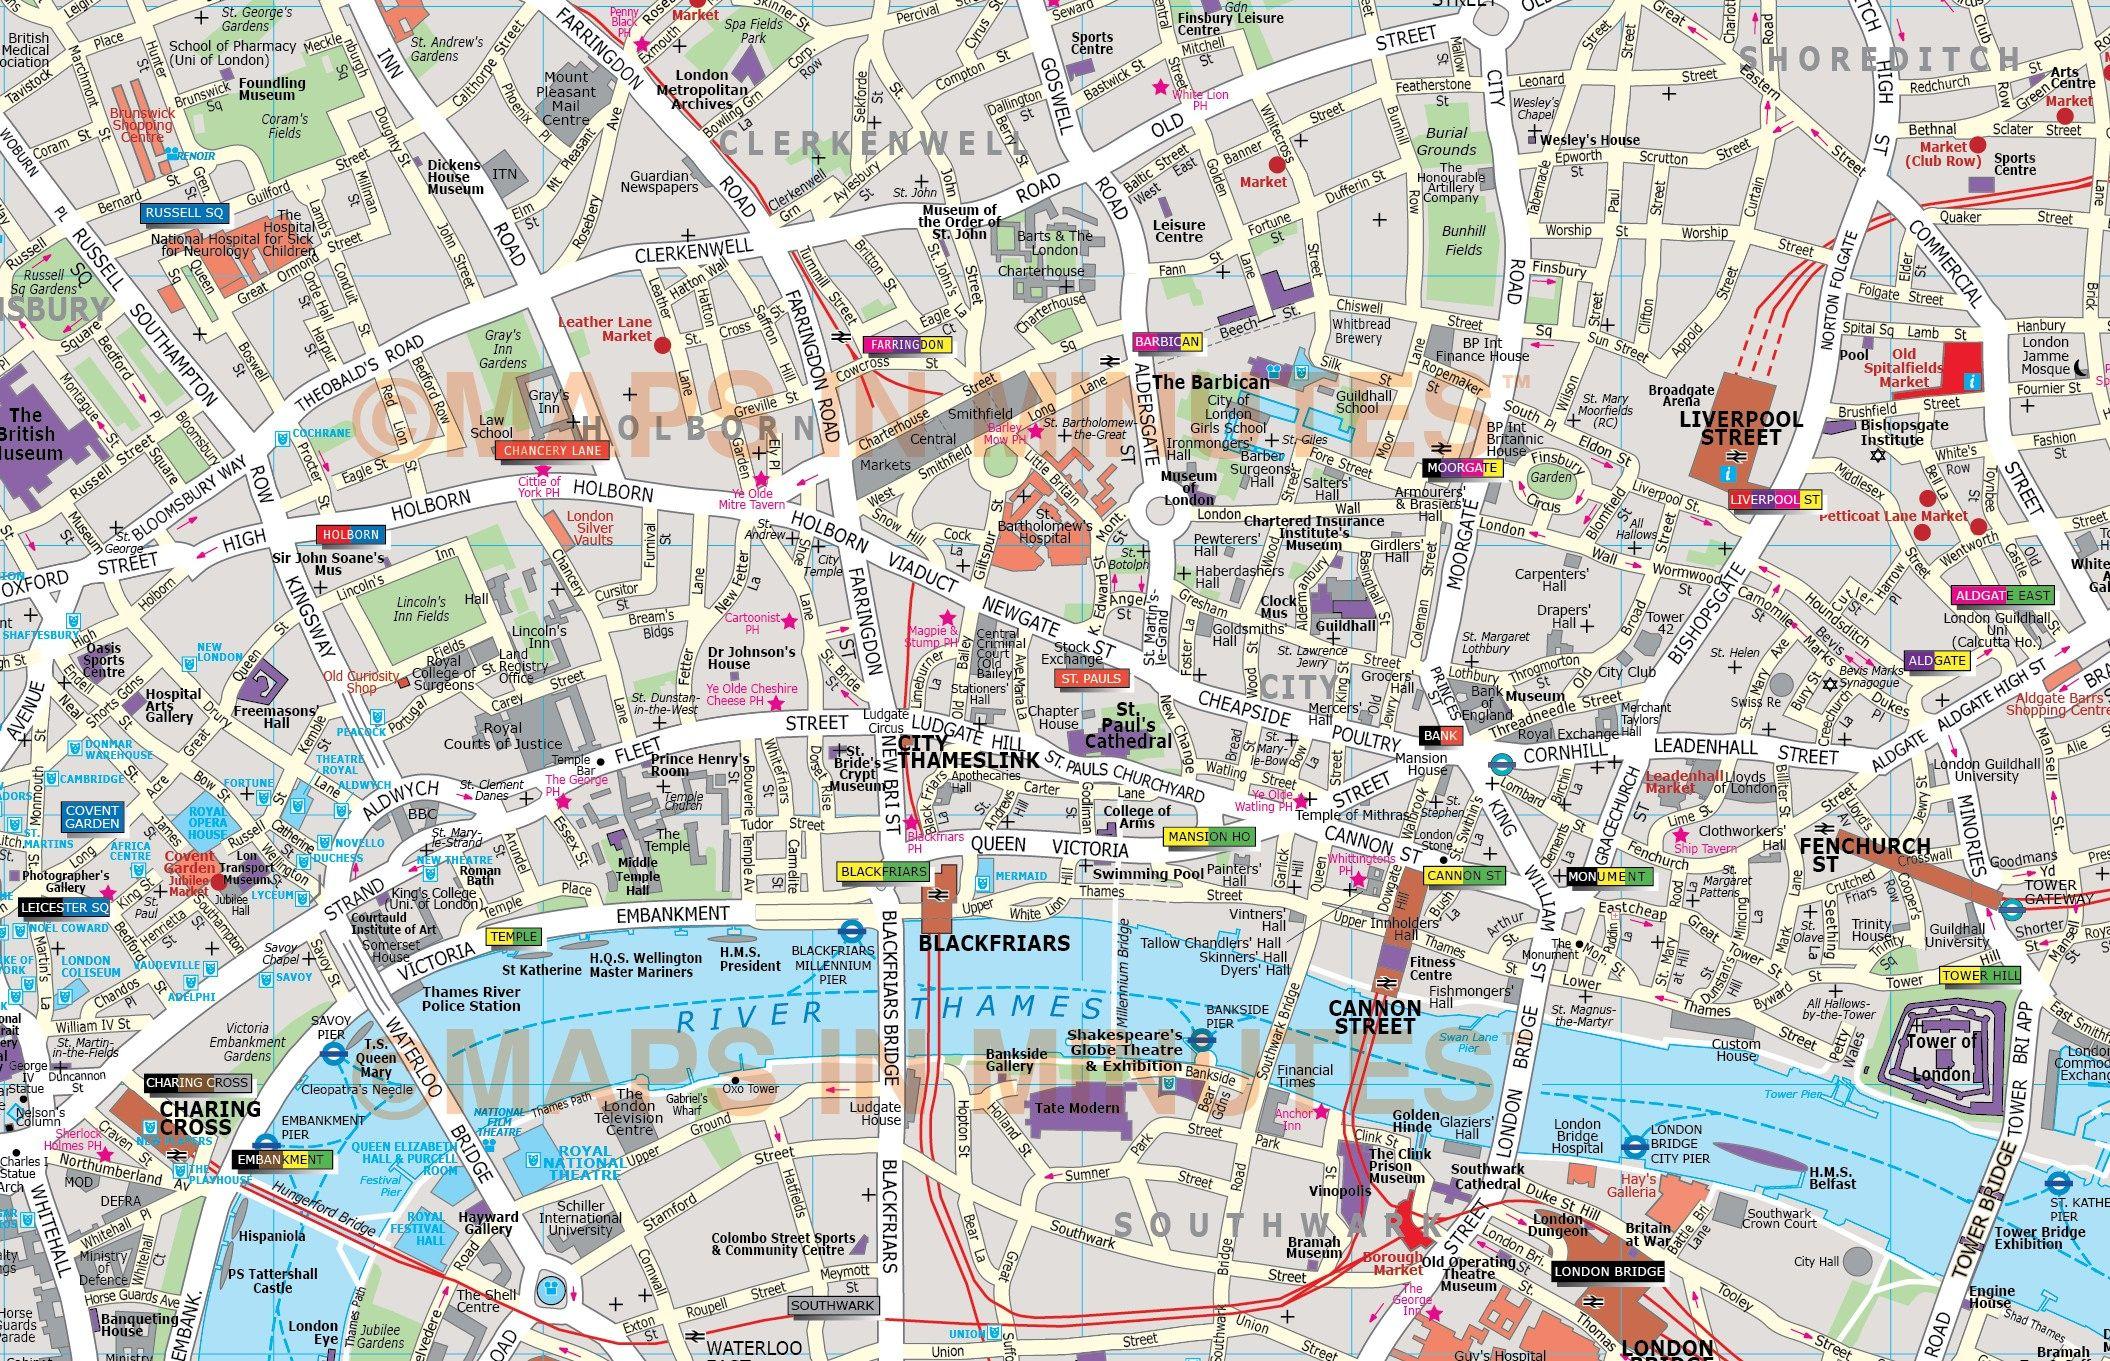 map london city deluxe london city map in illustrator editable vector format